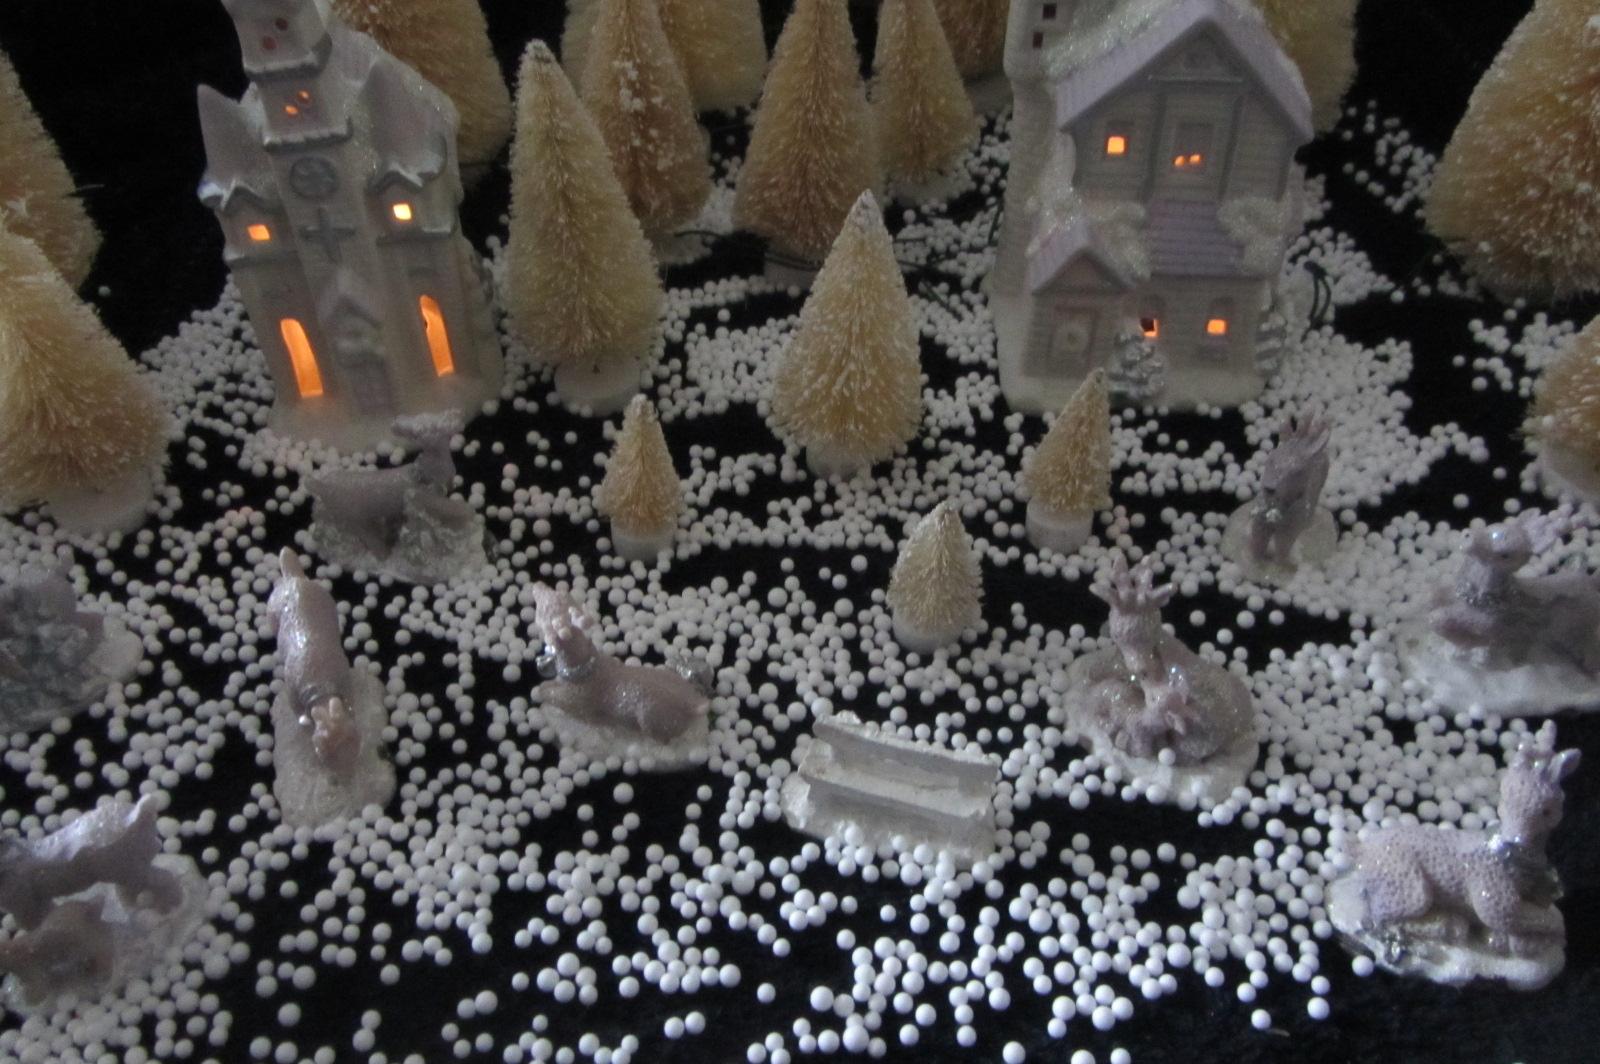 CHRISTMAS SCENE BRUSH TREES SNOW VILLAGE ANIMALS LIGHT UP ALL NEW DISPLAY SIDE